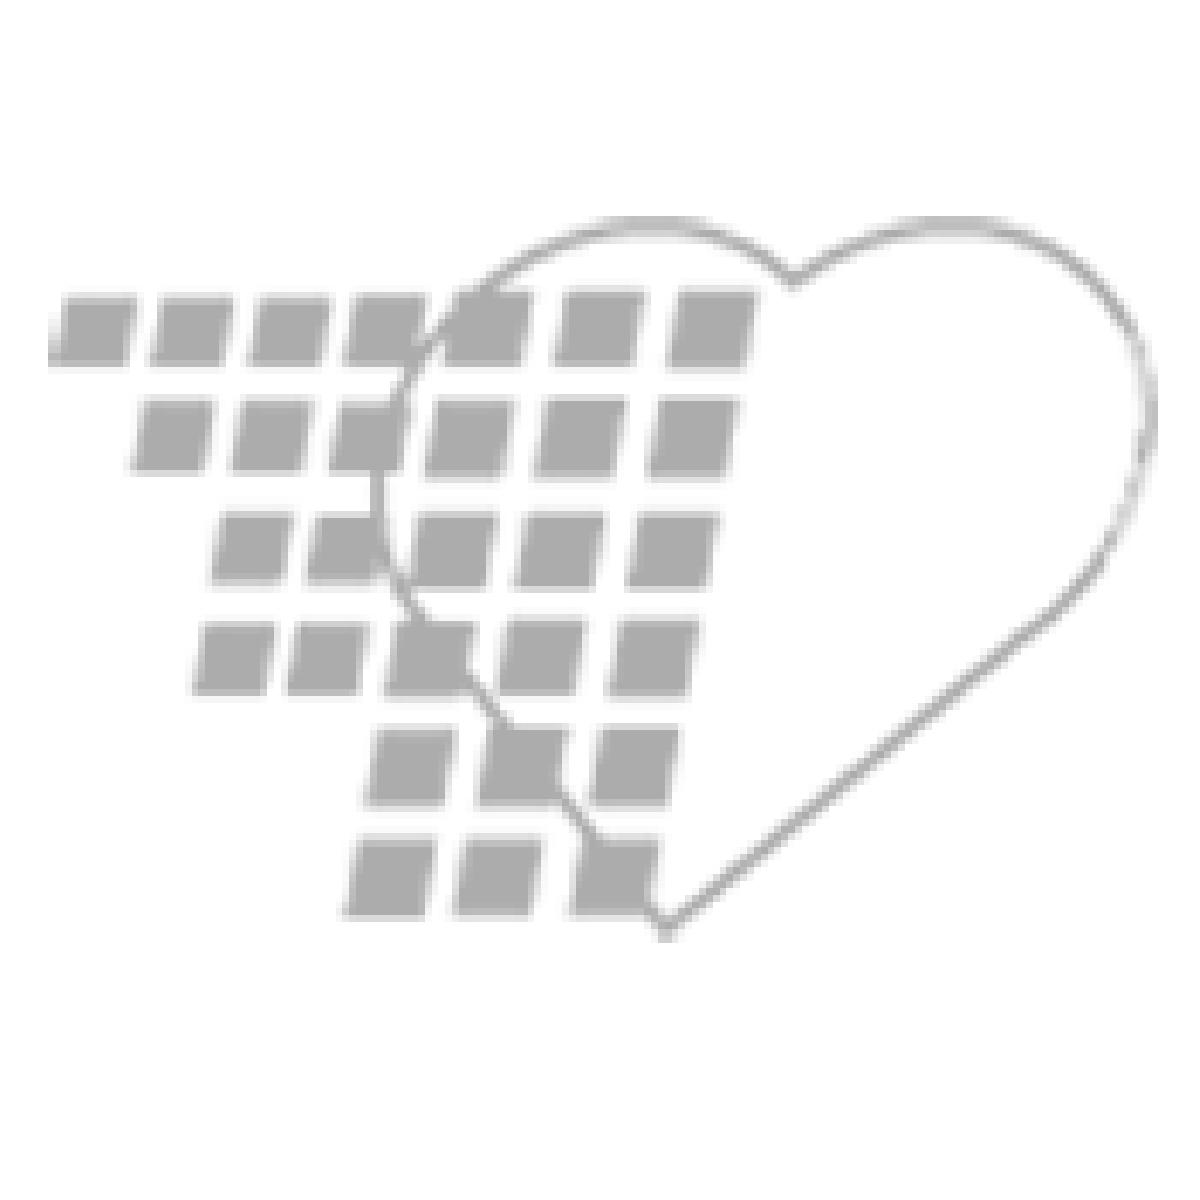 06-93-1143 Demo Dose® Sodim Bicrb 4.2% Pediatric 10mL